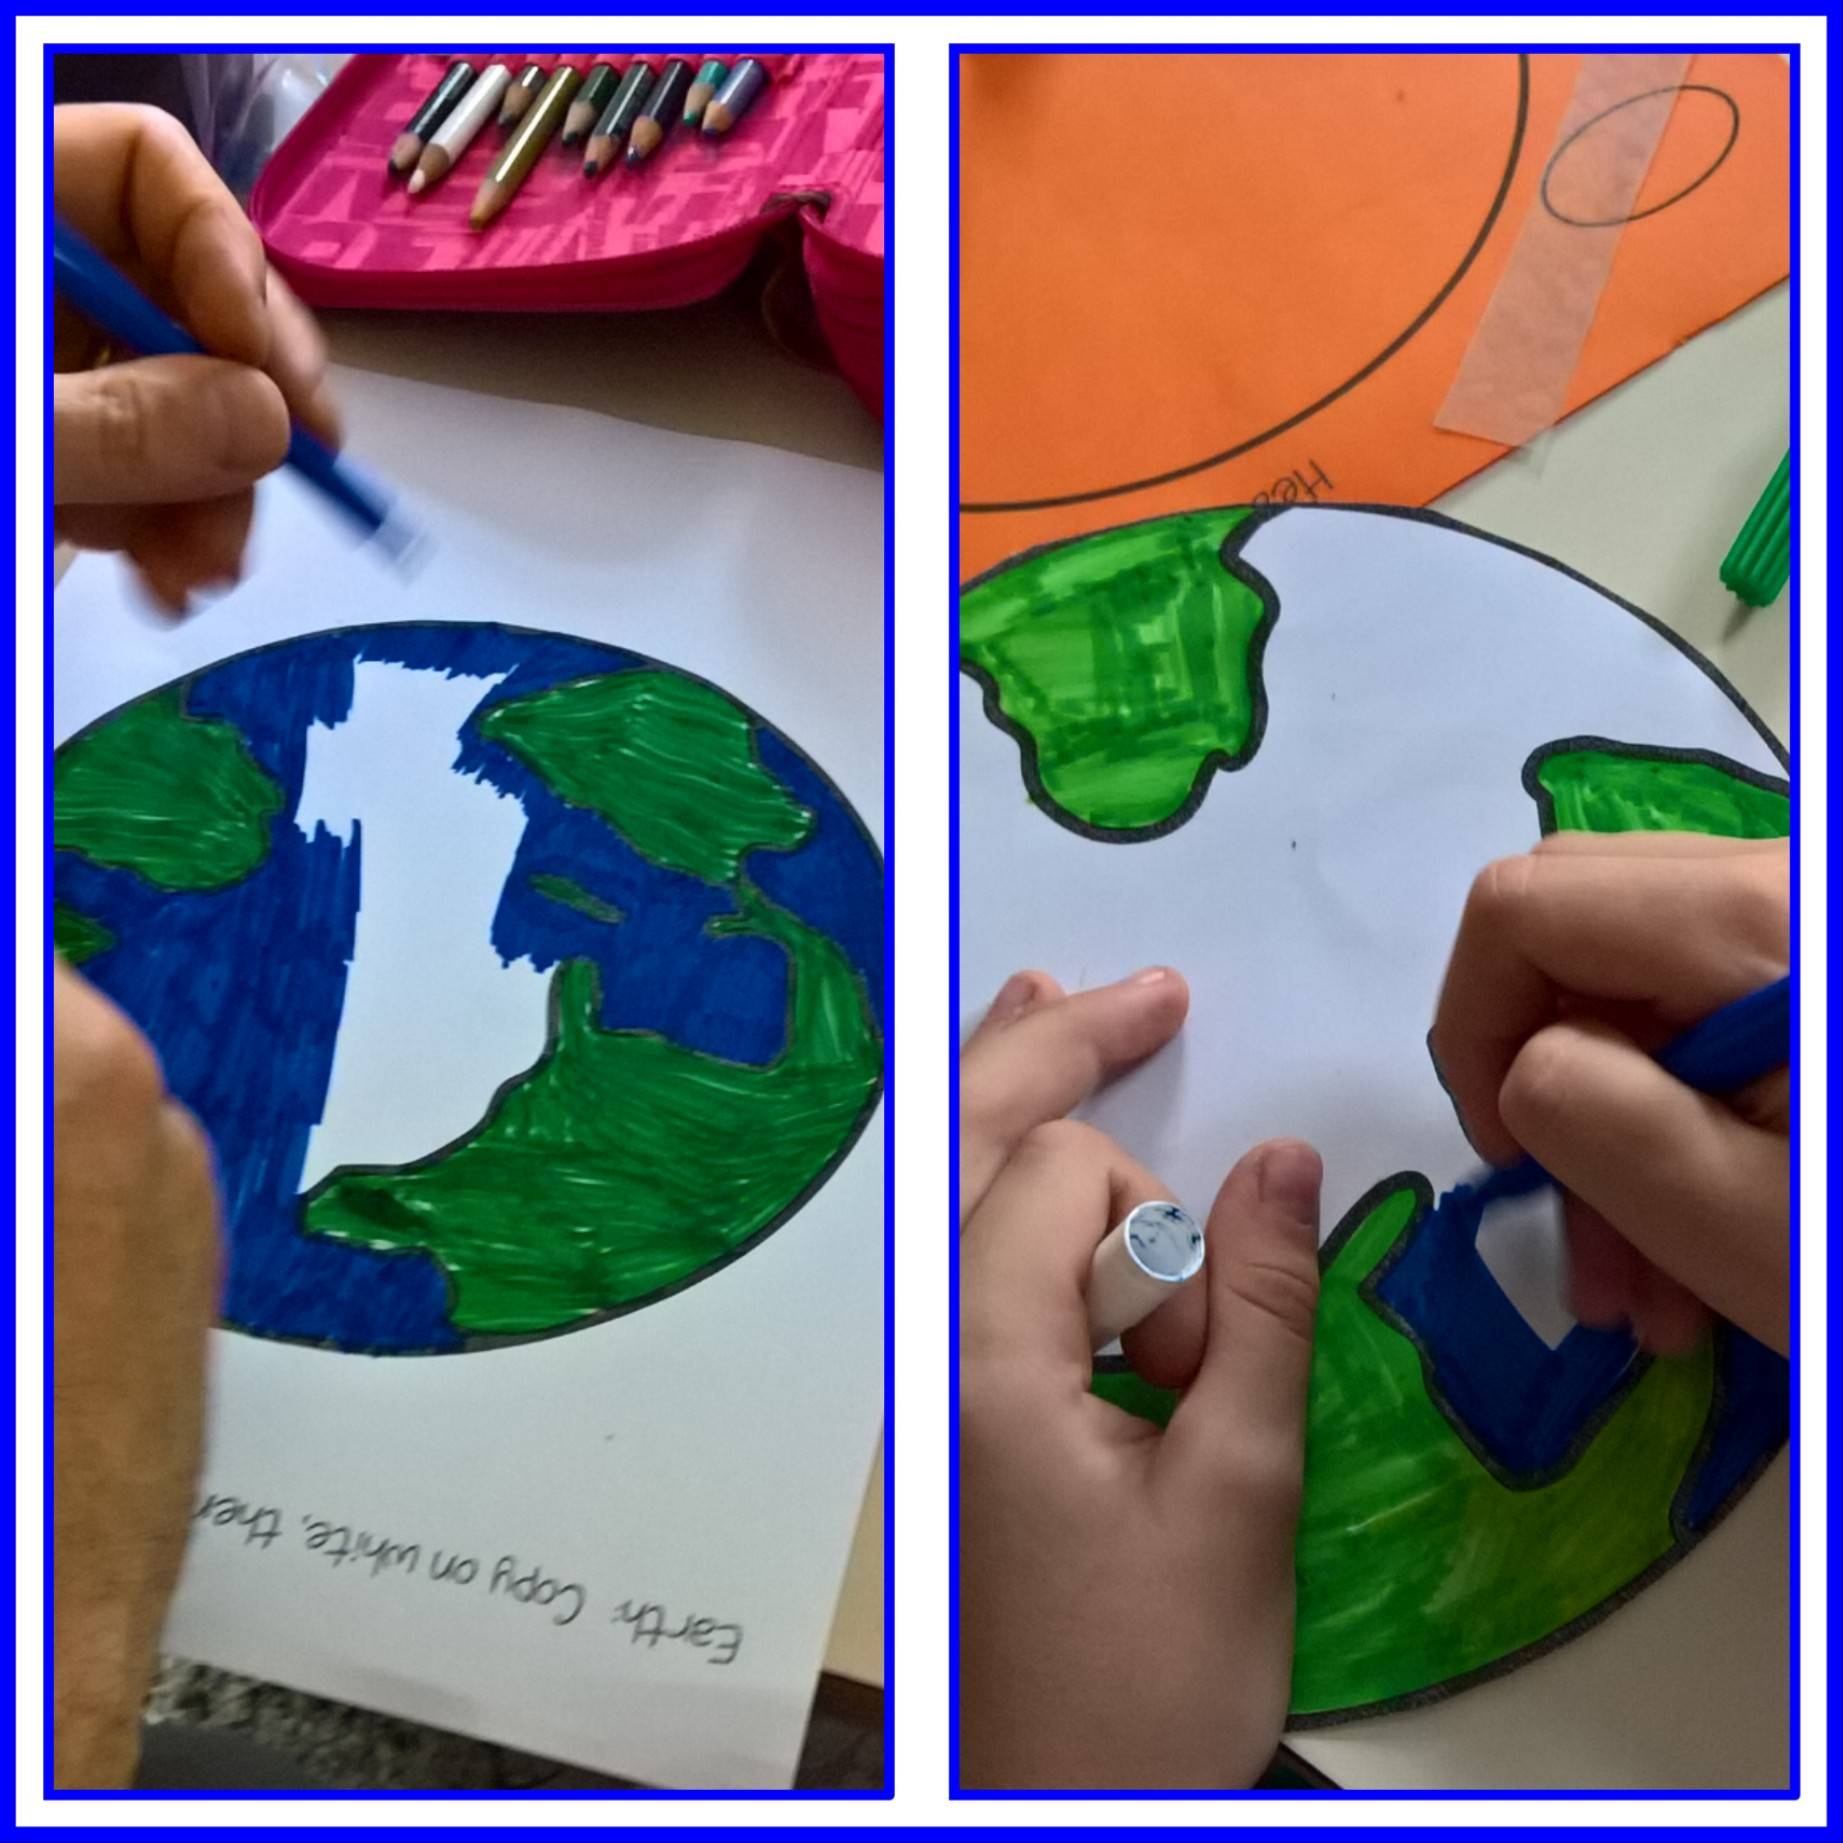 LORAX EARTH DAY ACTIVITY